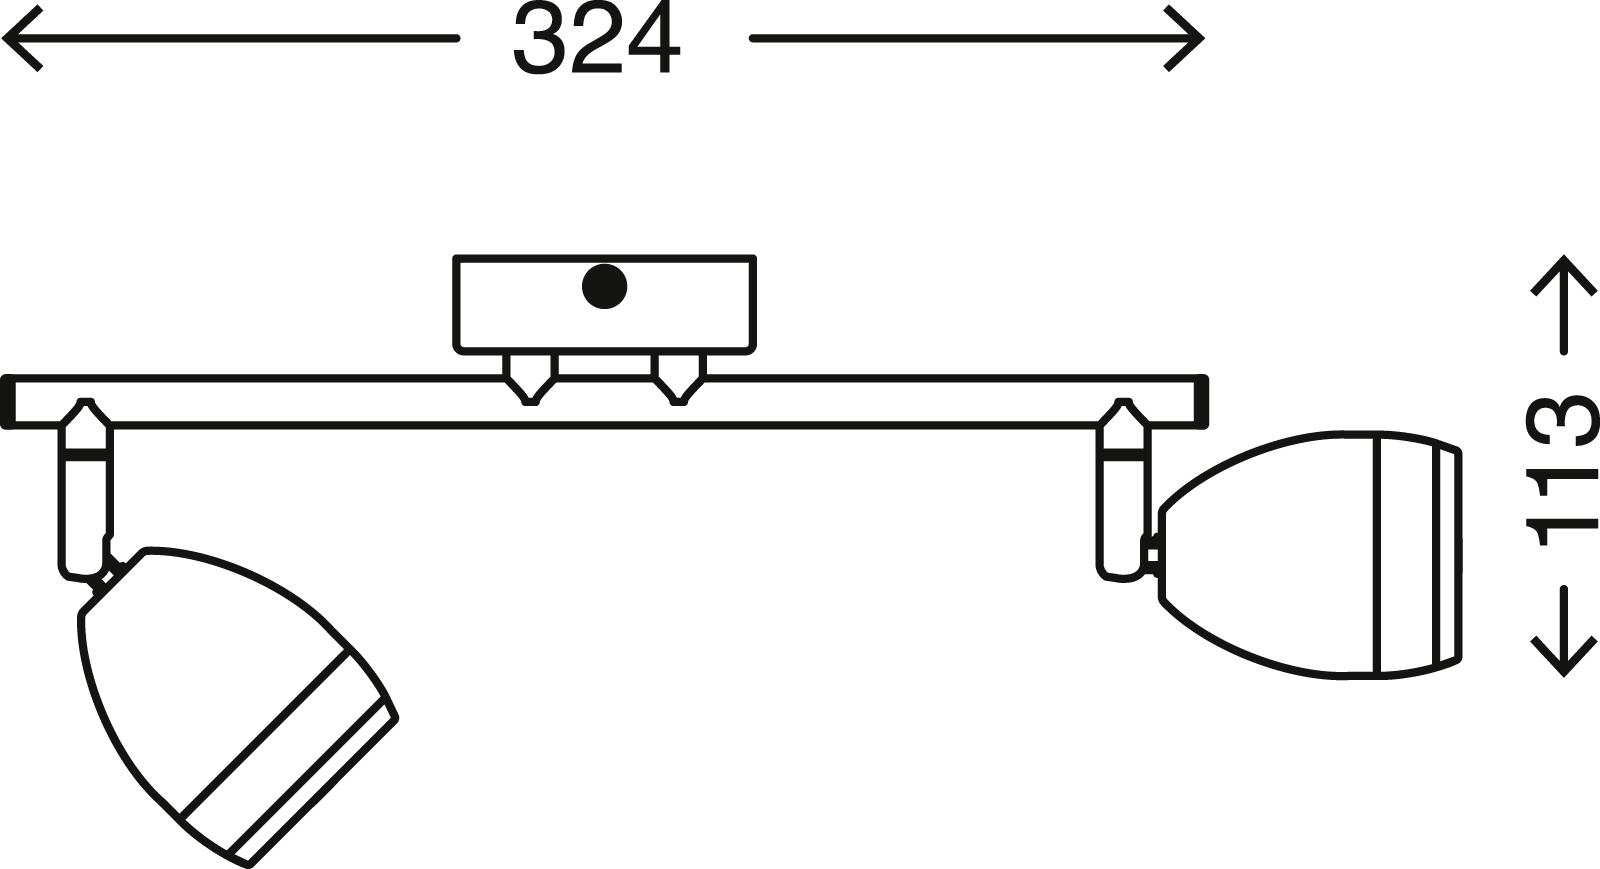 LED Spot Deckenleuchte, 32,4 cm, 8 W, Chrom